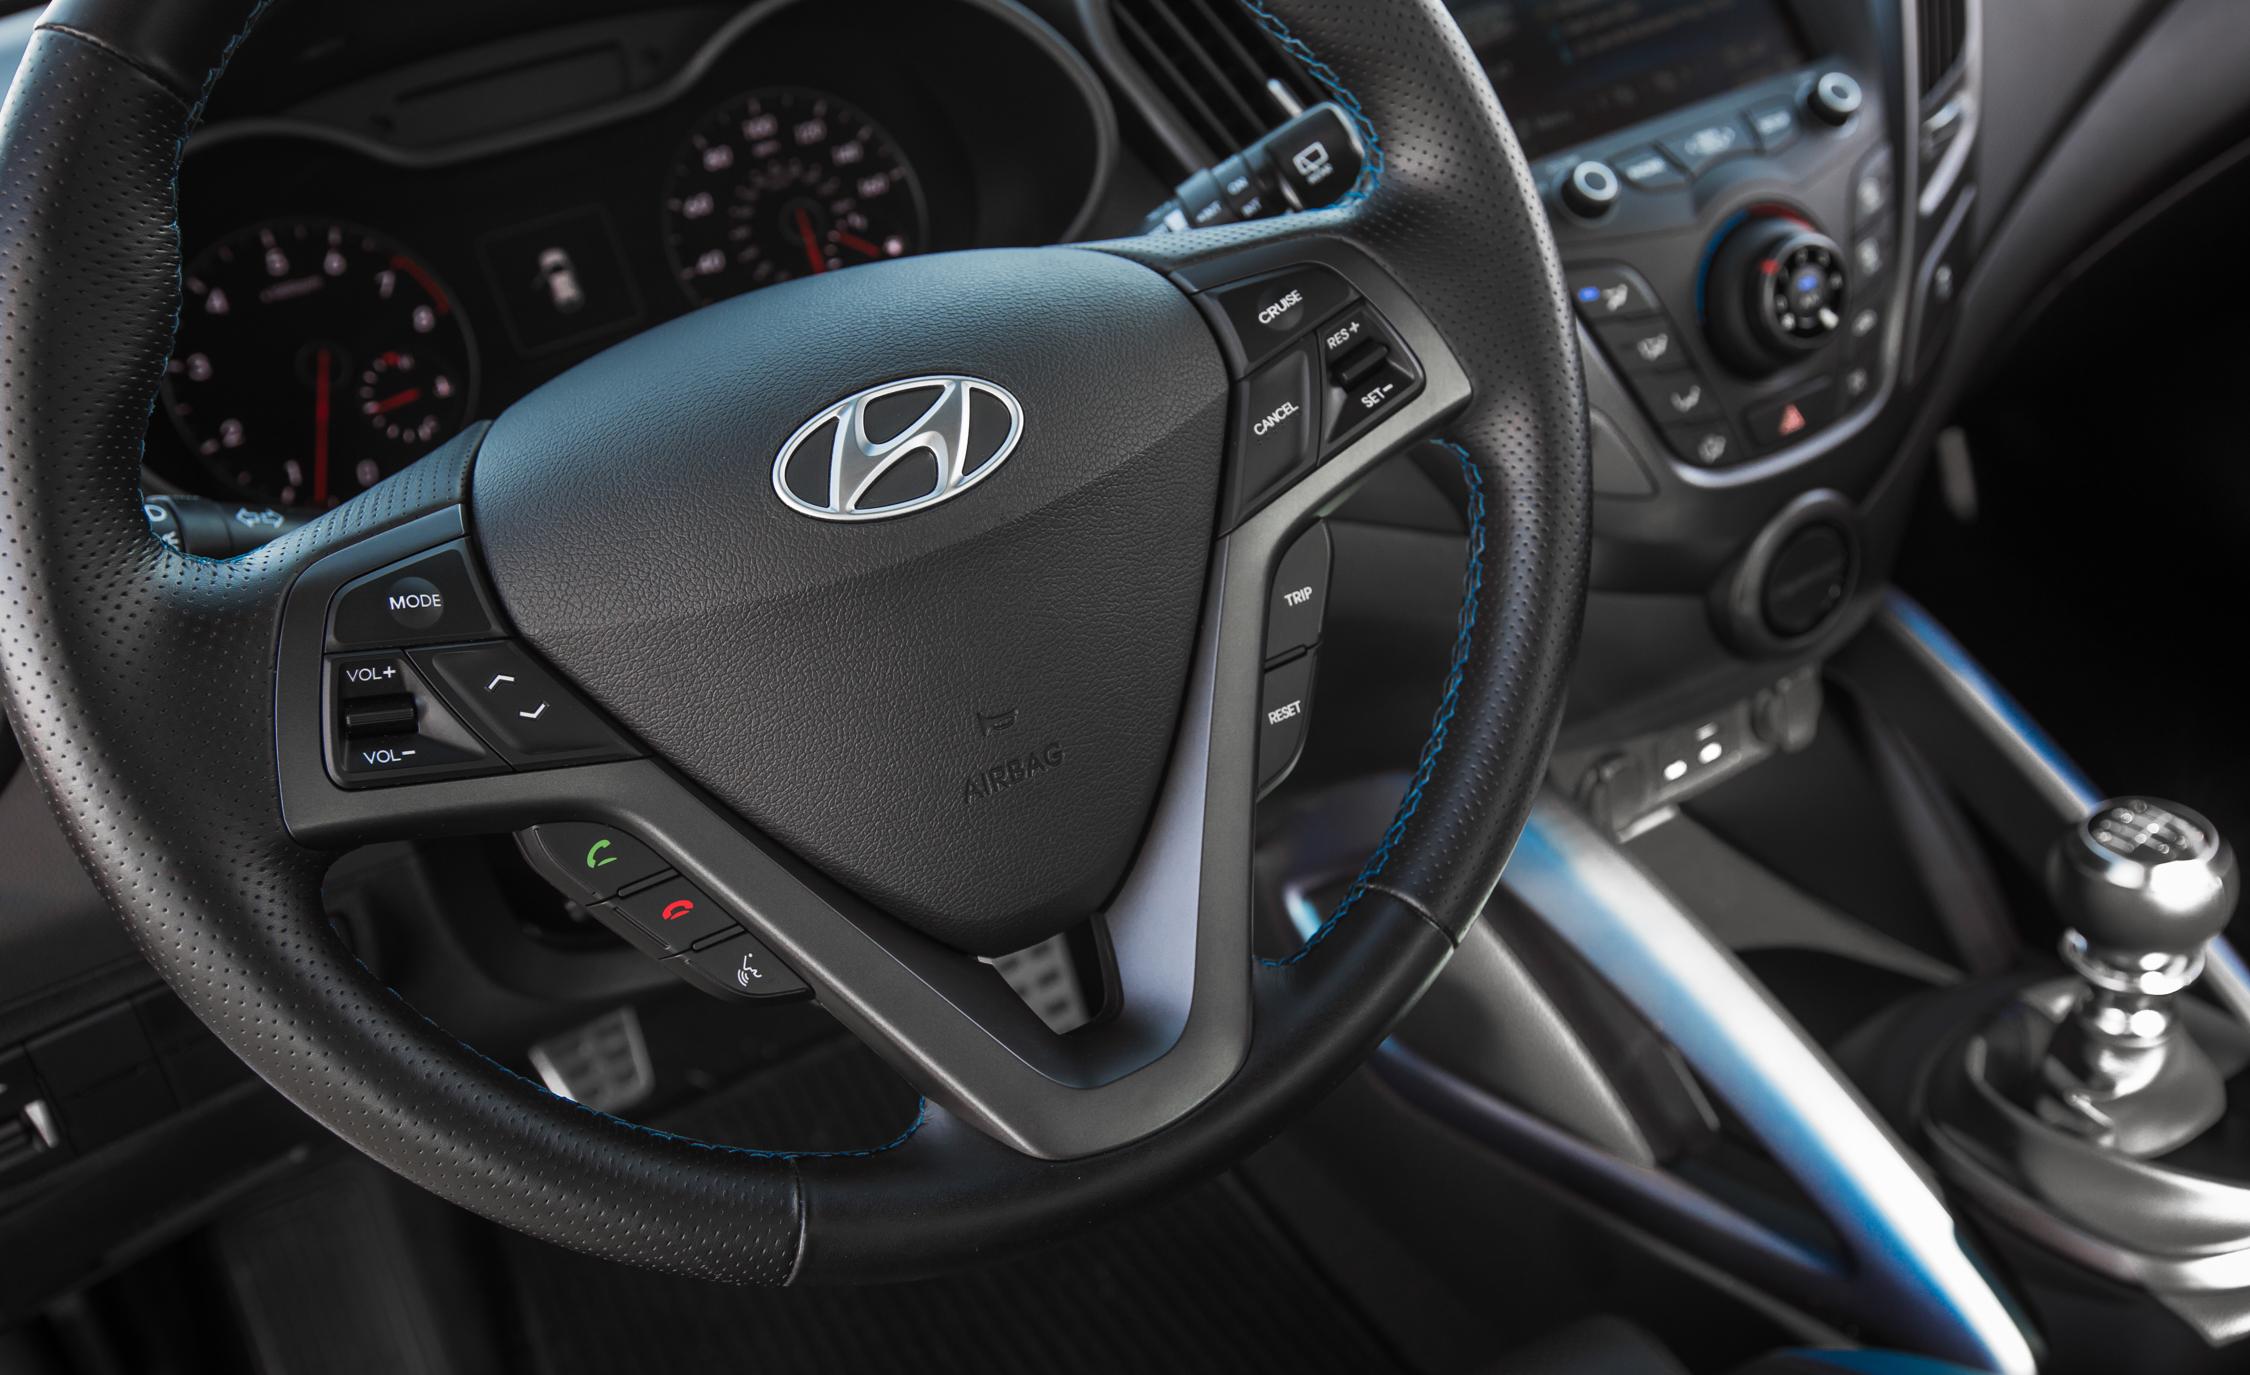 2016 Hyundai Veloster Turbo Rally Edition Interior Steering